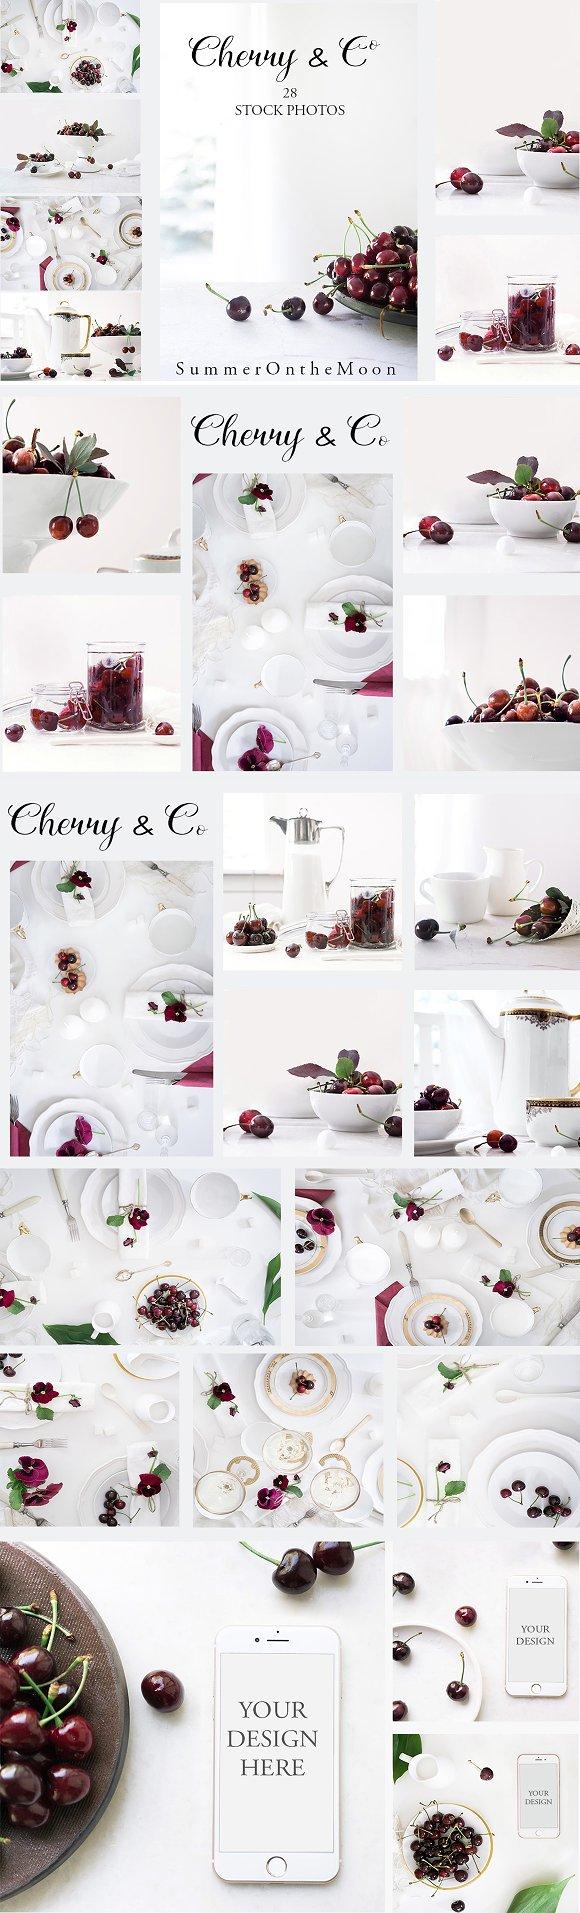 Cherry Co Photos Mockups